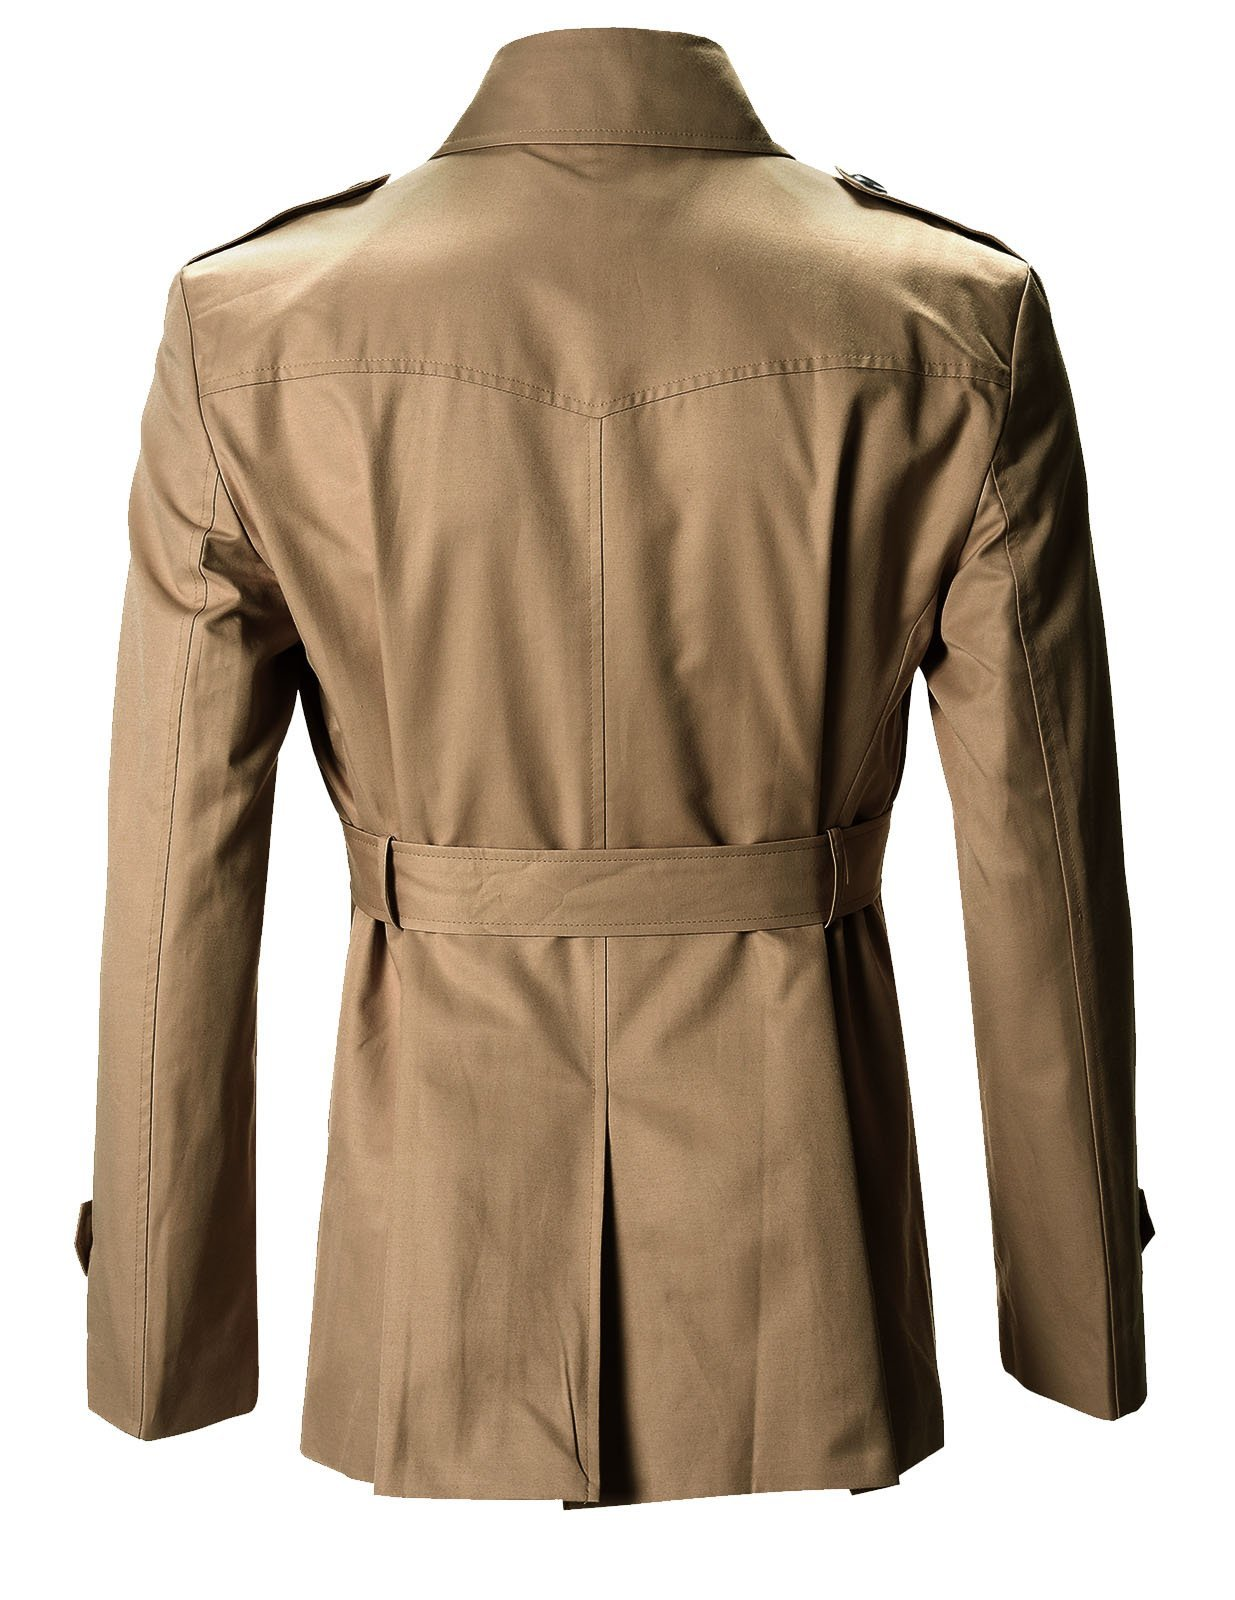 FLATSEVEN Mens Slim Fit Designer Casual Trench Coat (FCT201) Dark Beige, Size XL by FLATSEVEN (Image #3)